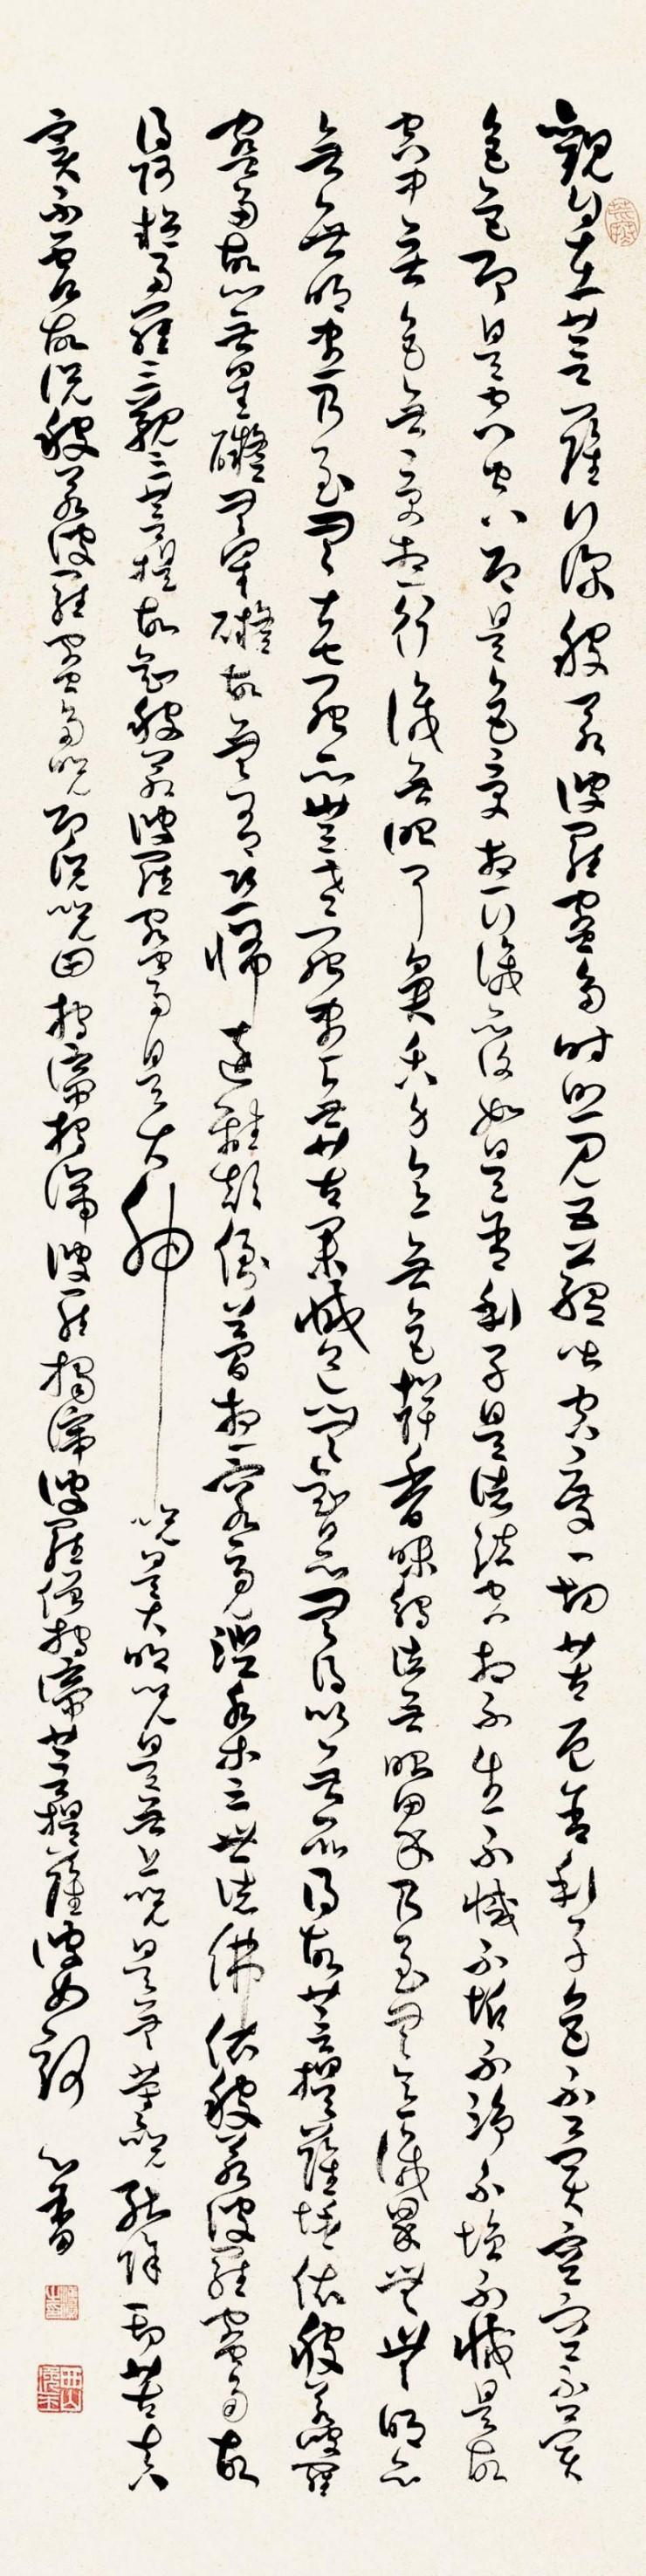 BanyaHeartSutra/Letter